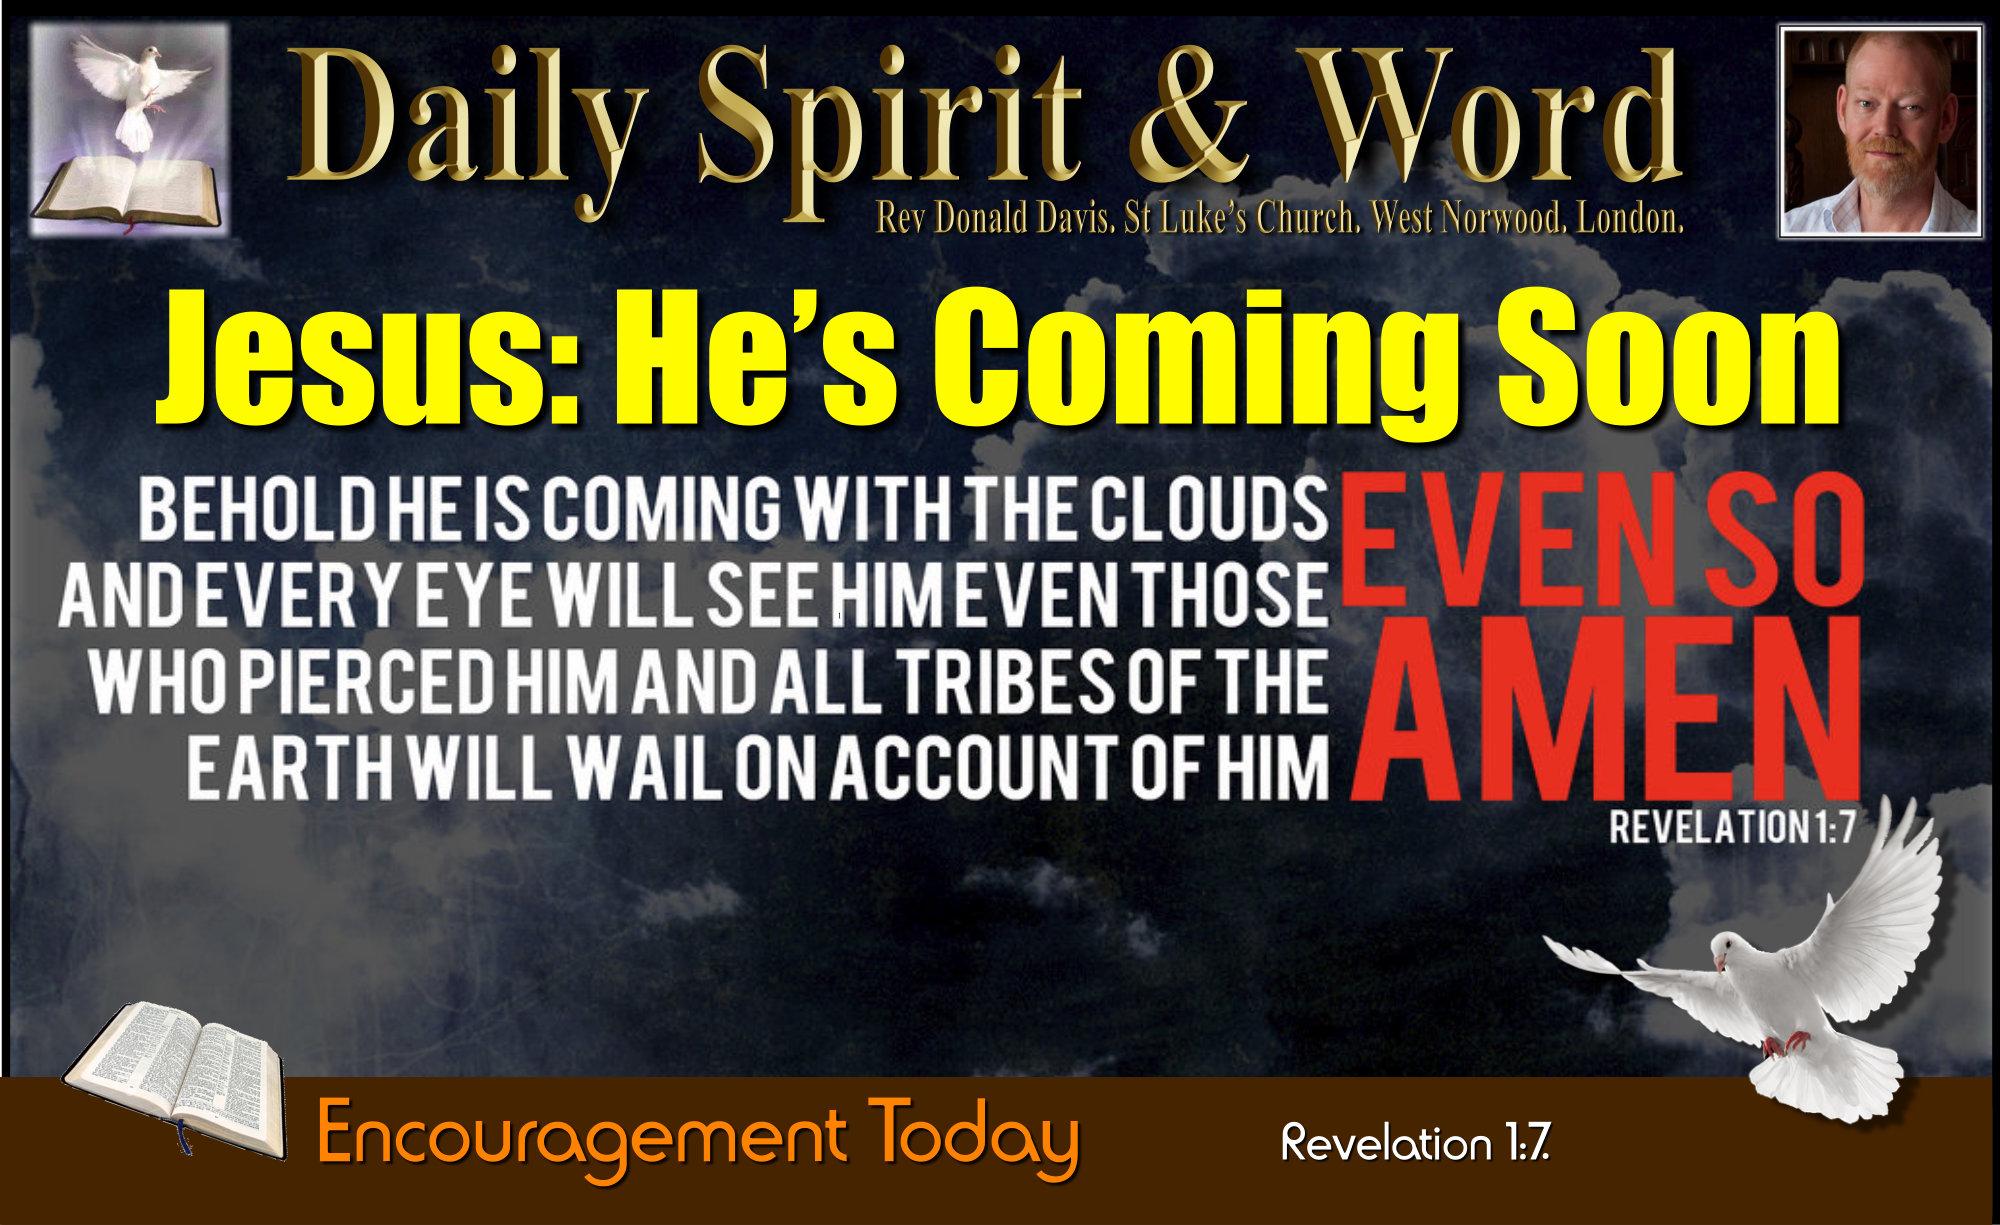 Every Eye Shall See Him: Jesus